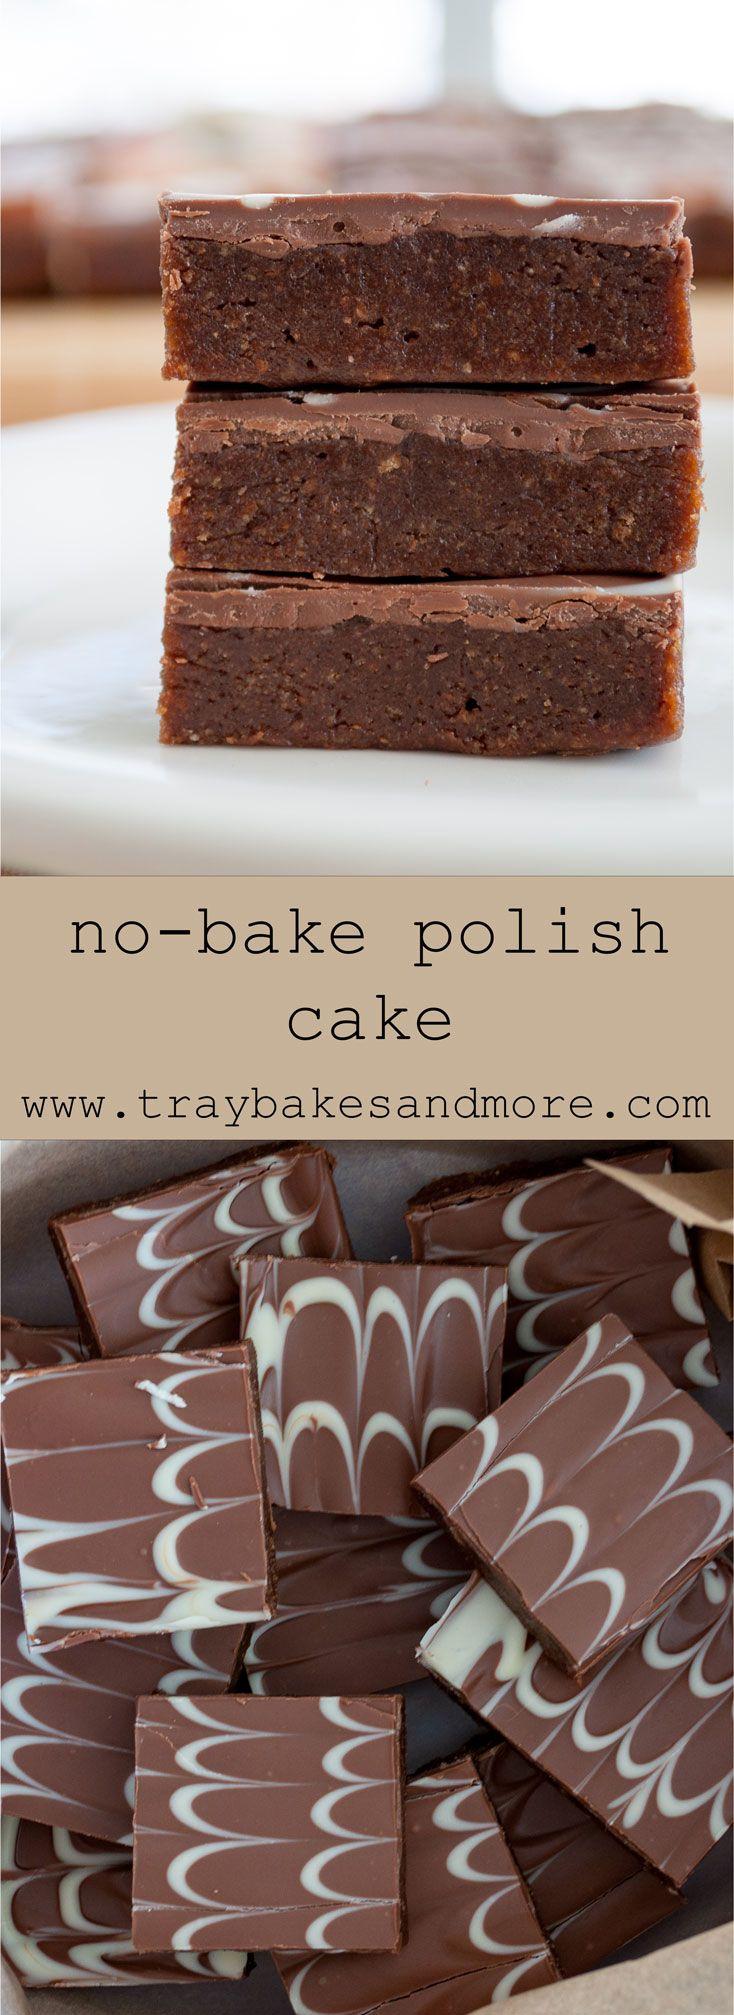 Photo of No-Bake Polish Cake – traybakes & more